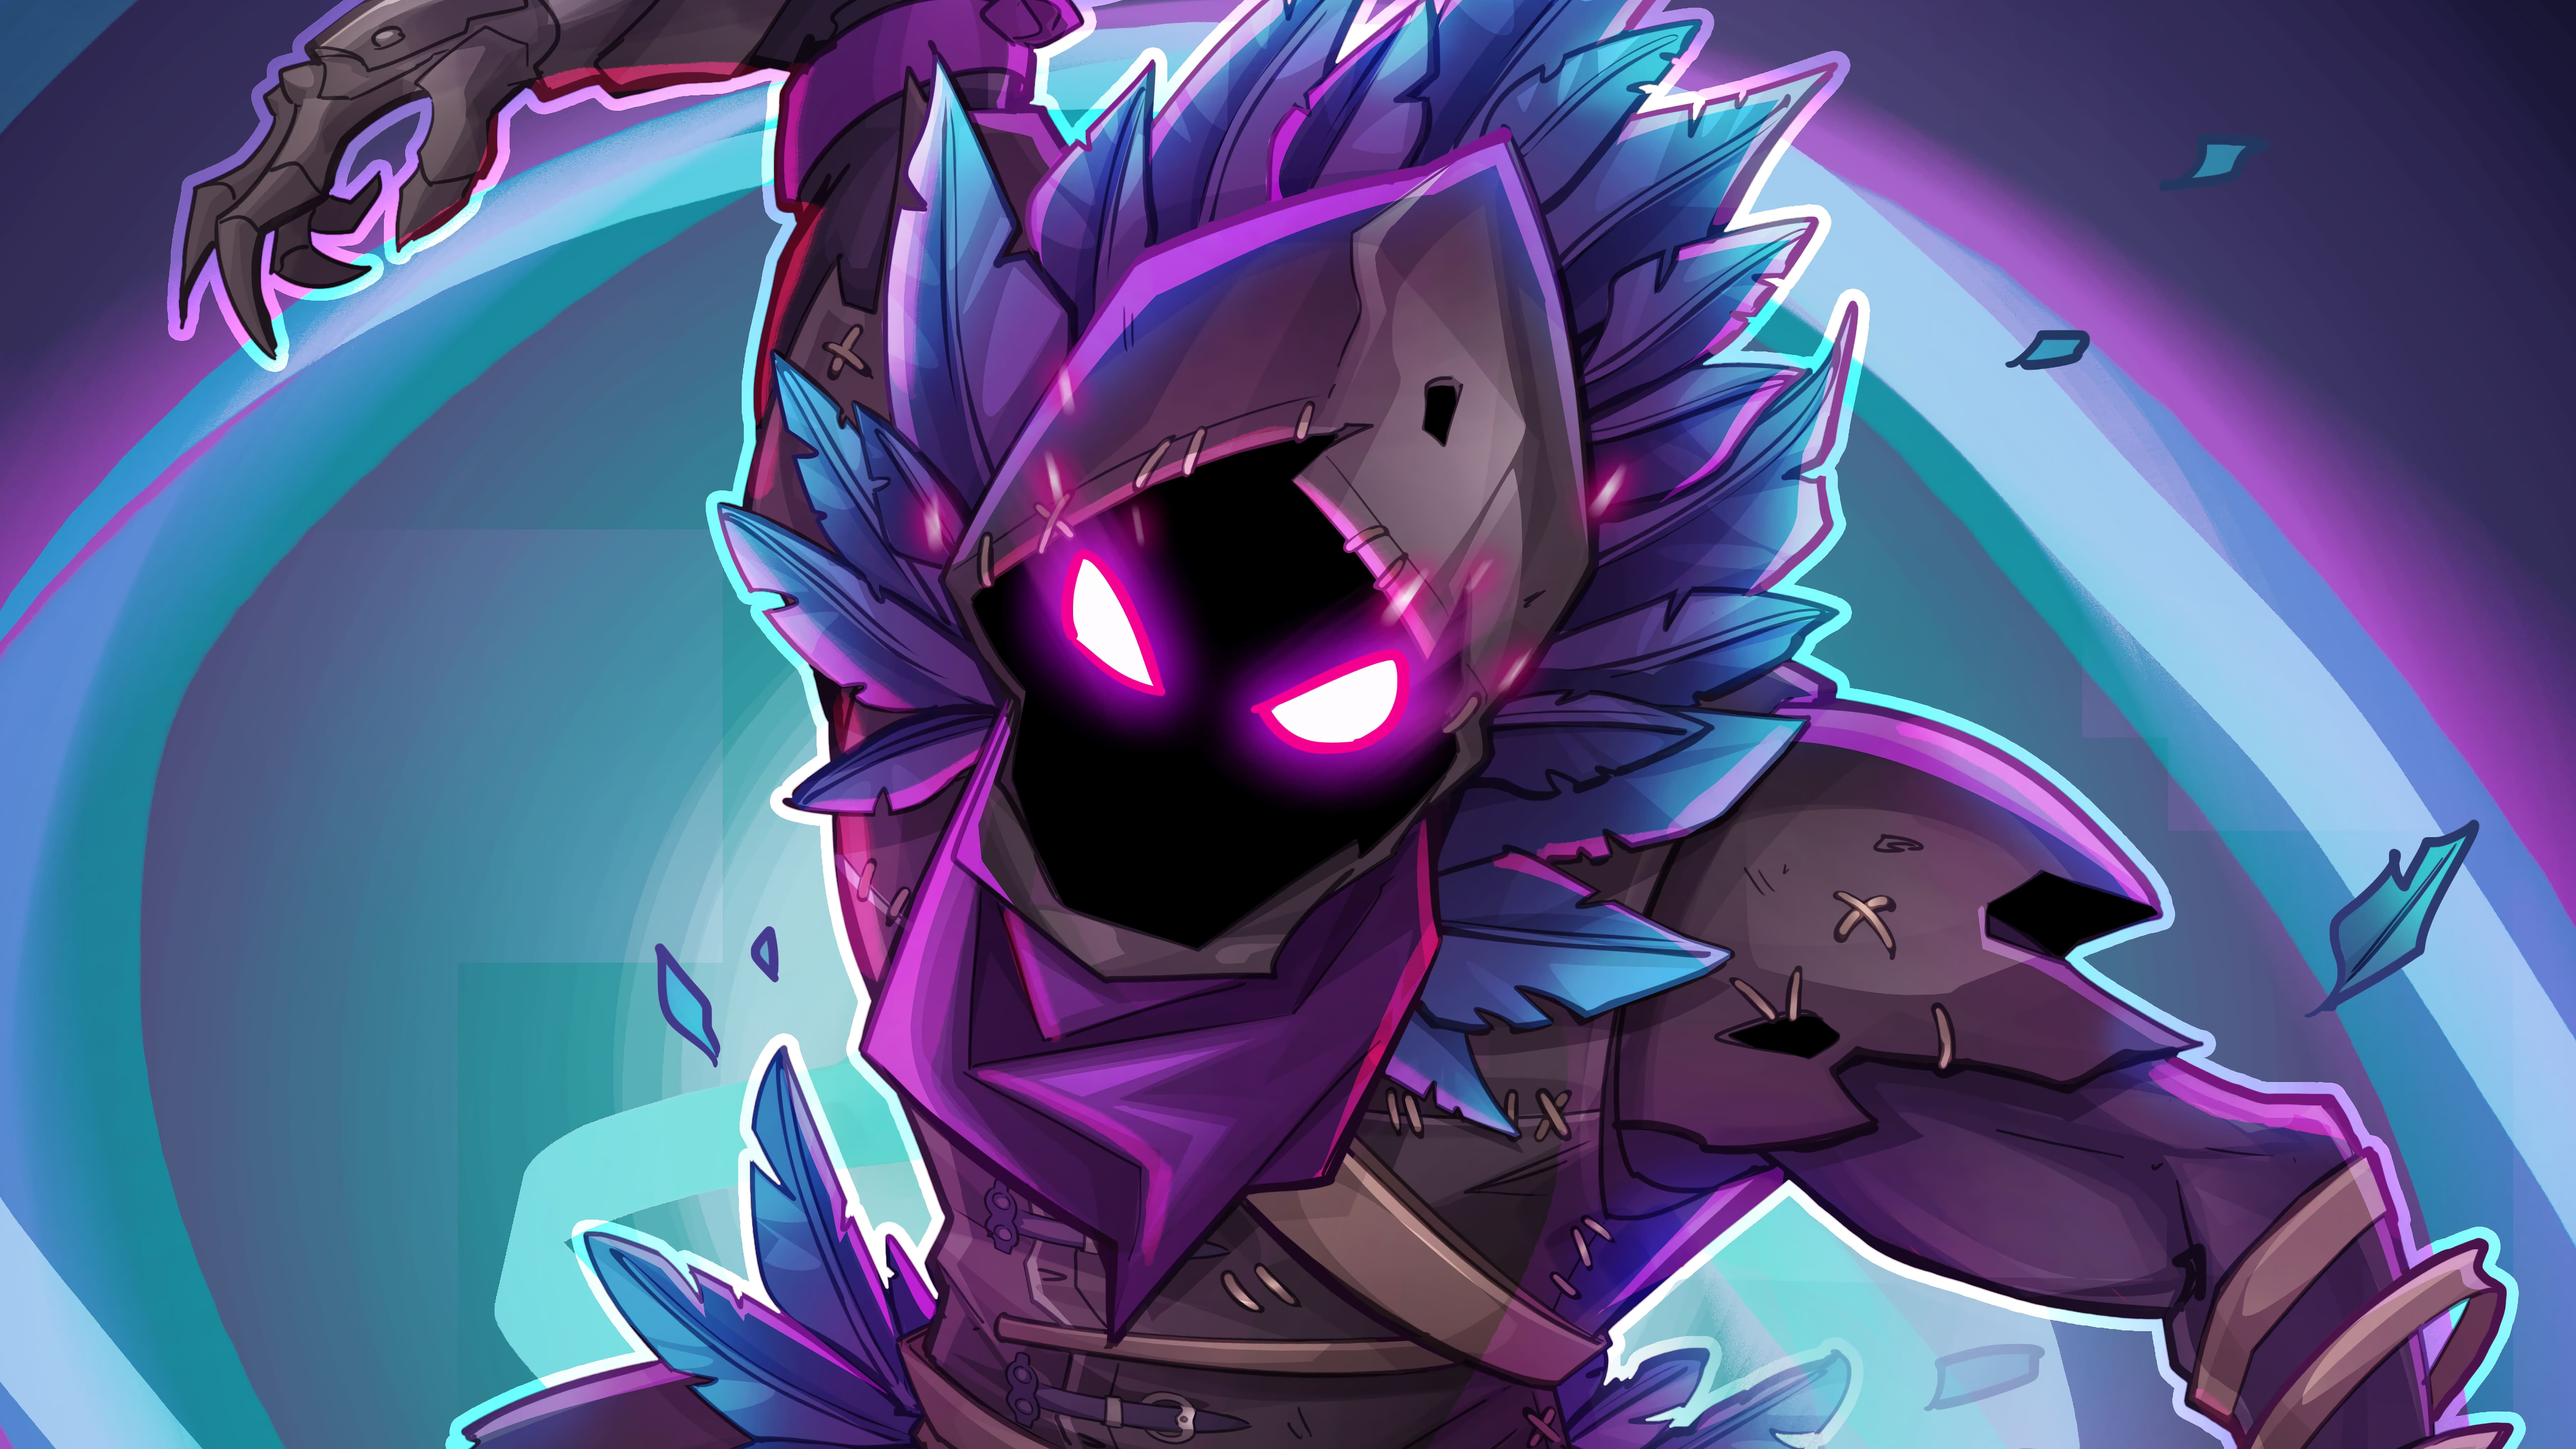 Raven Fortnite Battle Royale Wallpapers Top Free Raven Fortnite Battle Royale Backgrounds Wallpaperaccess